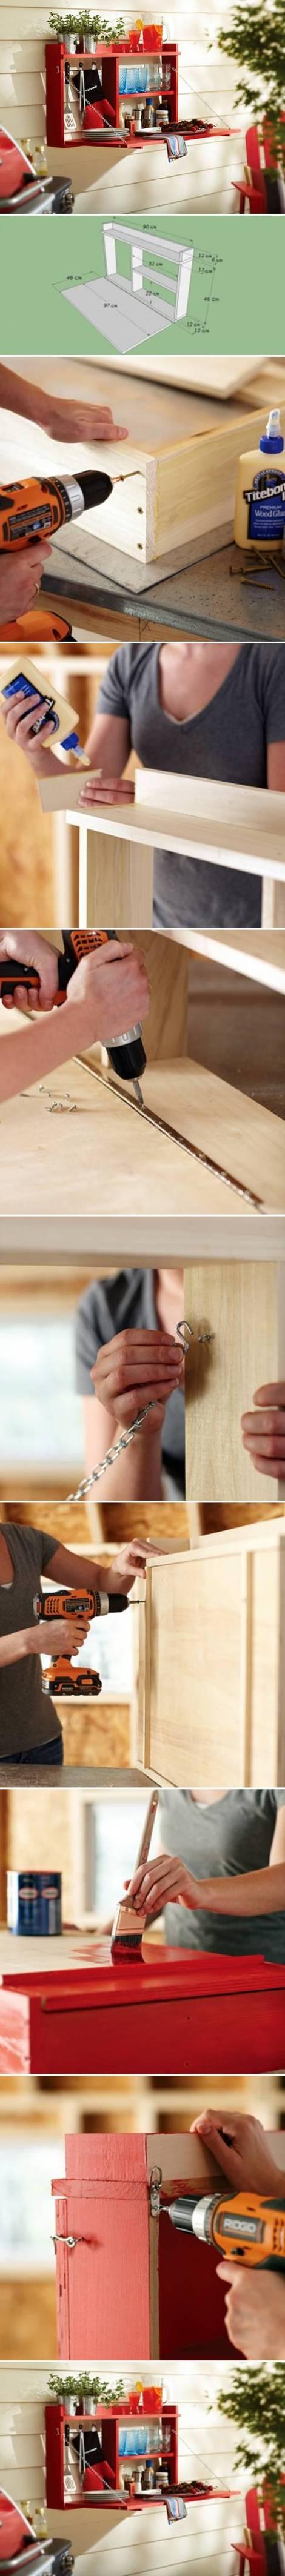 DIY-Wall-Mounted-Folding-Table